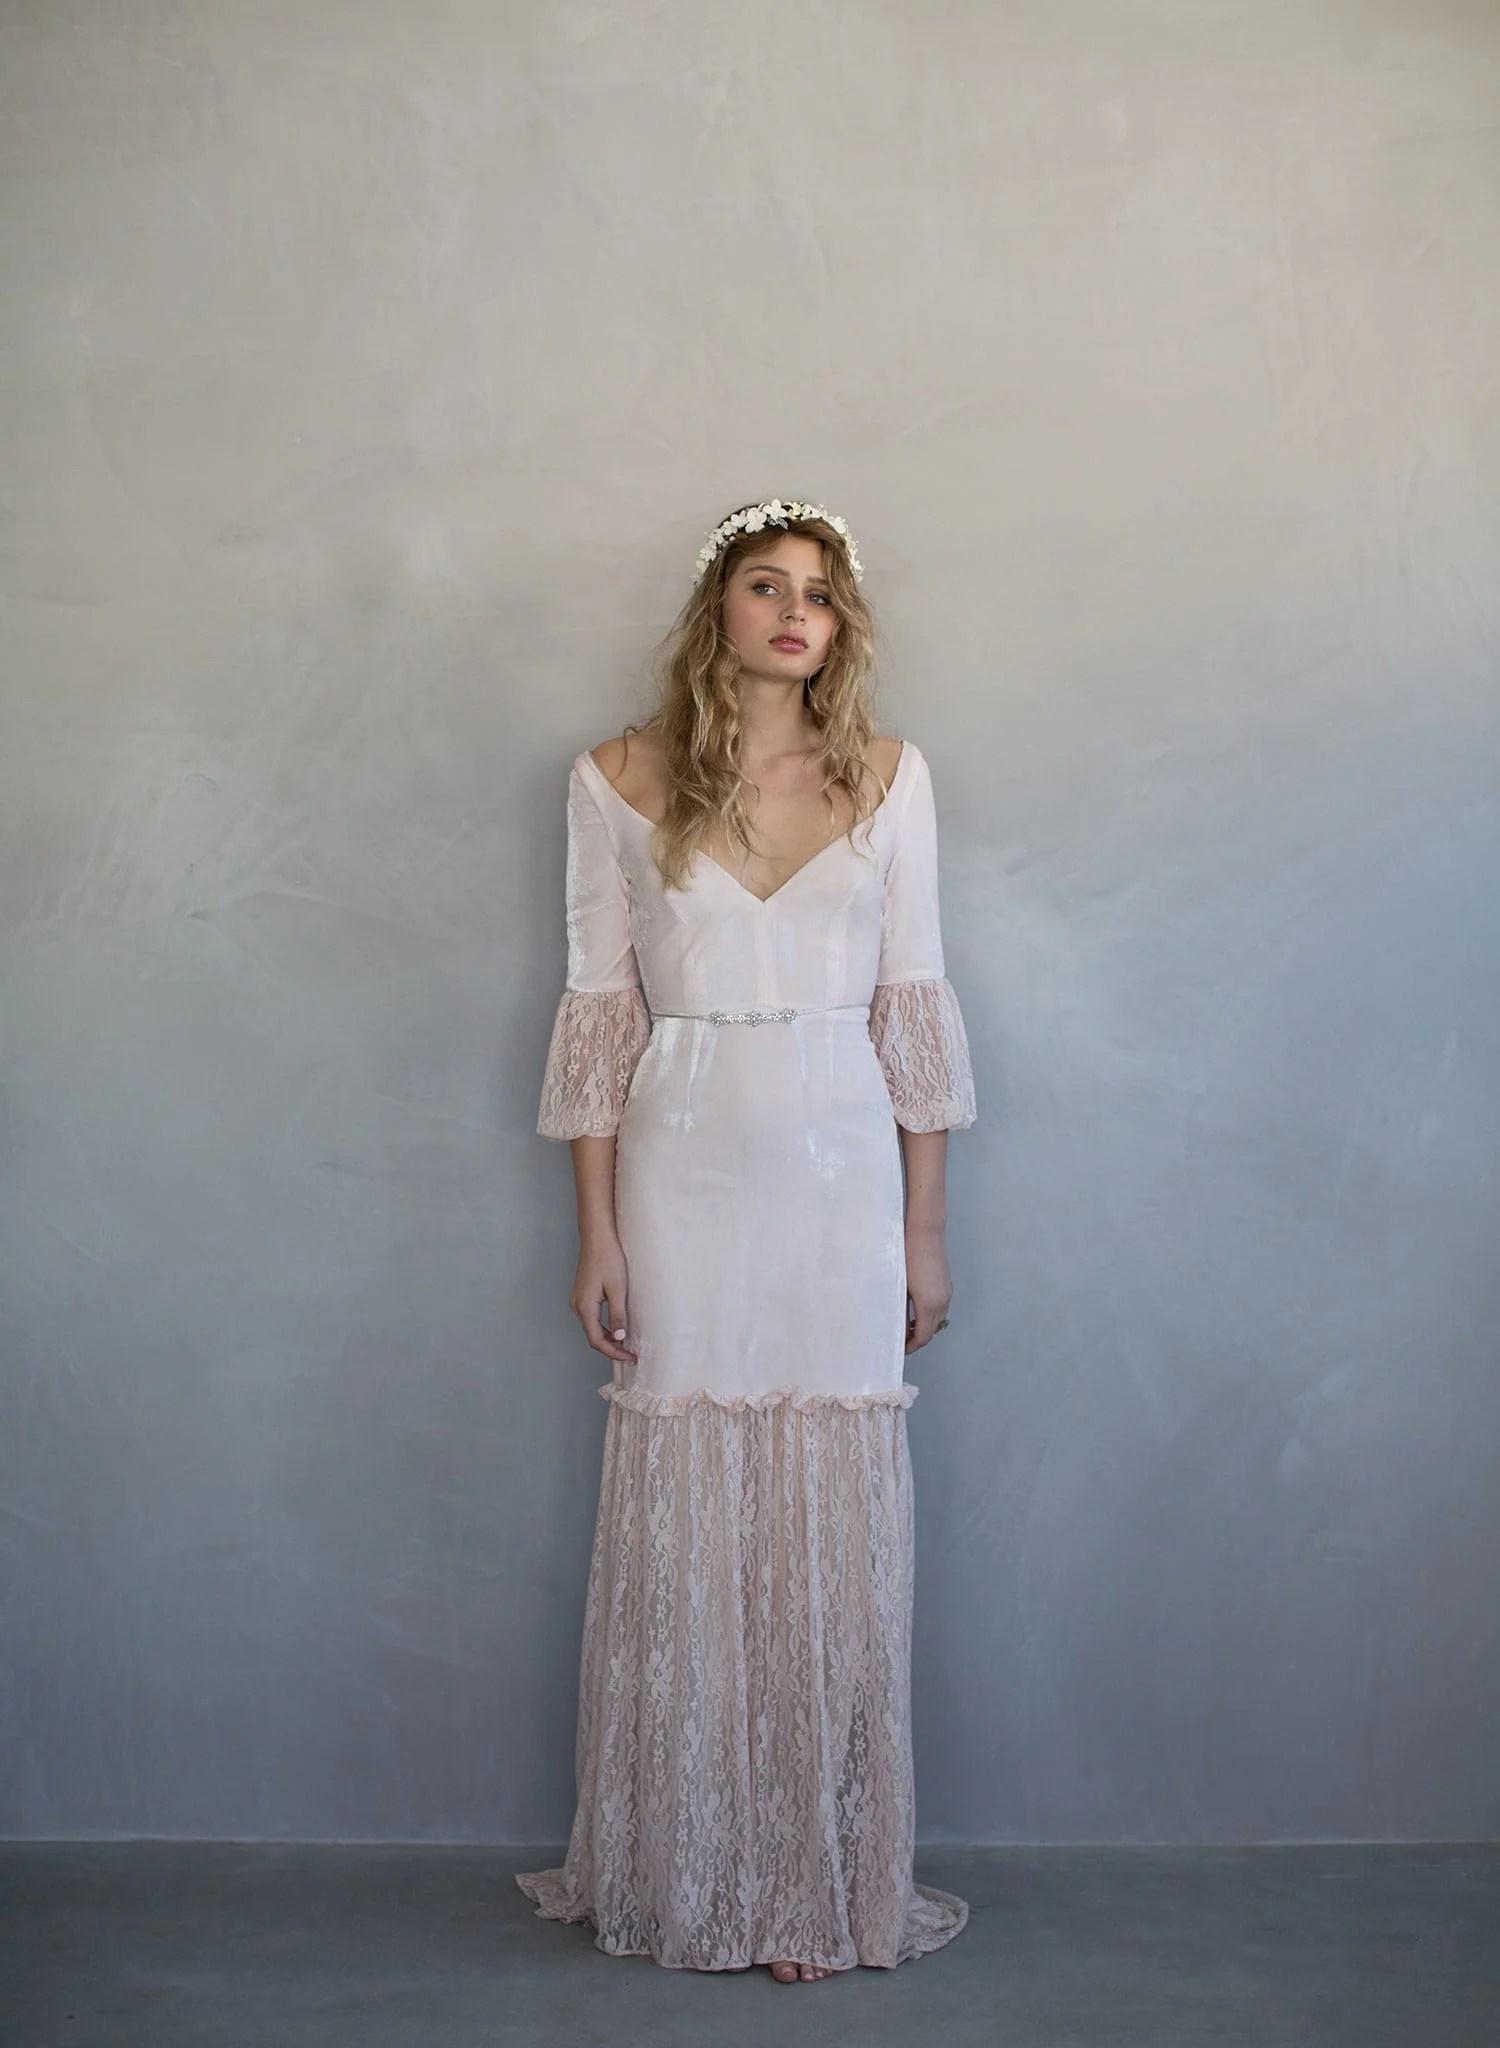 lolly velvet and lace gown style th velvet wedding dress Silk velvet bridal gown blush wedding dress twigs and honey vintage inspired